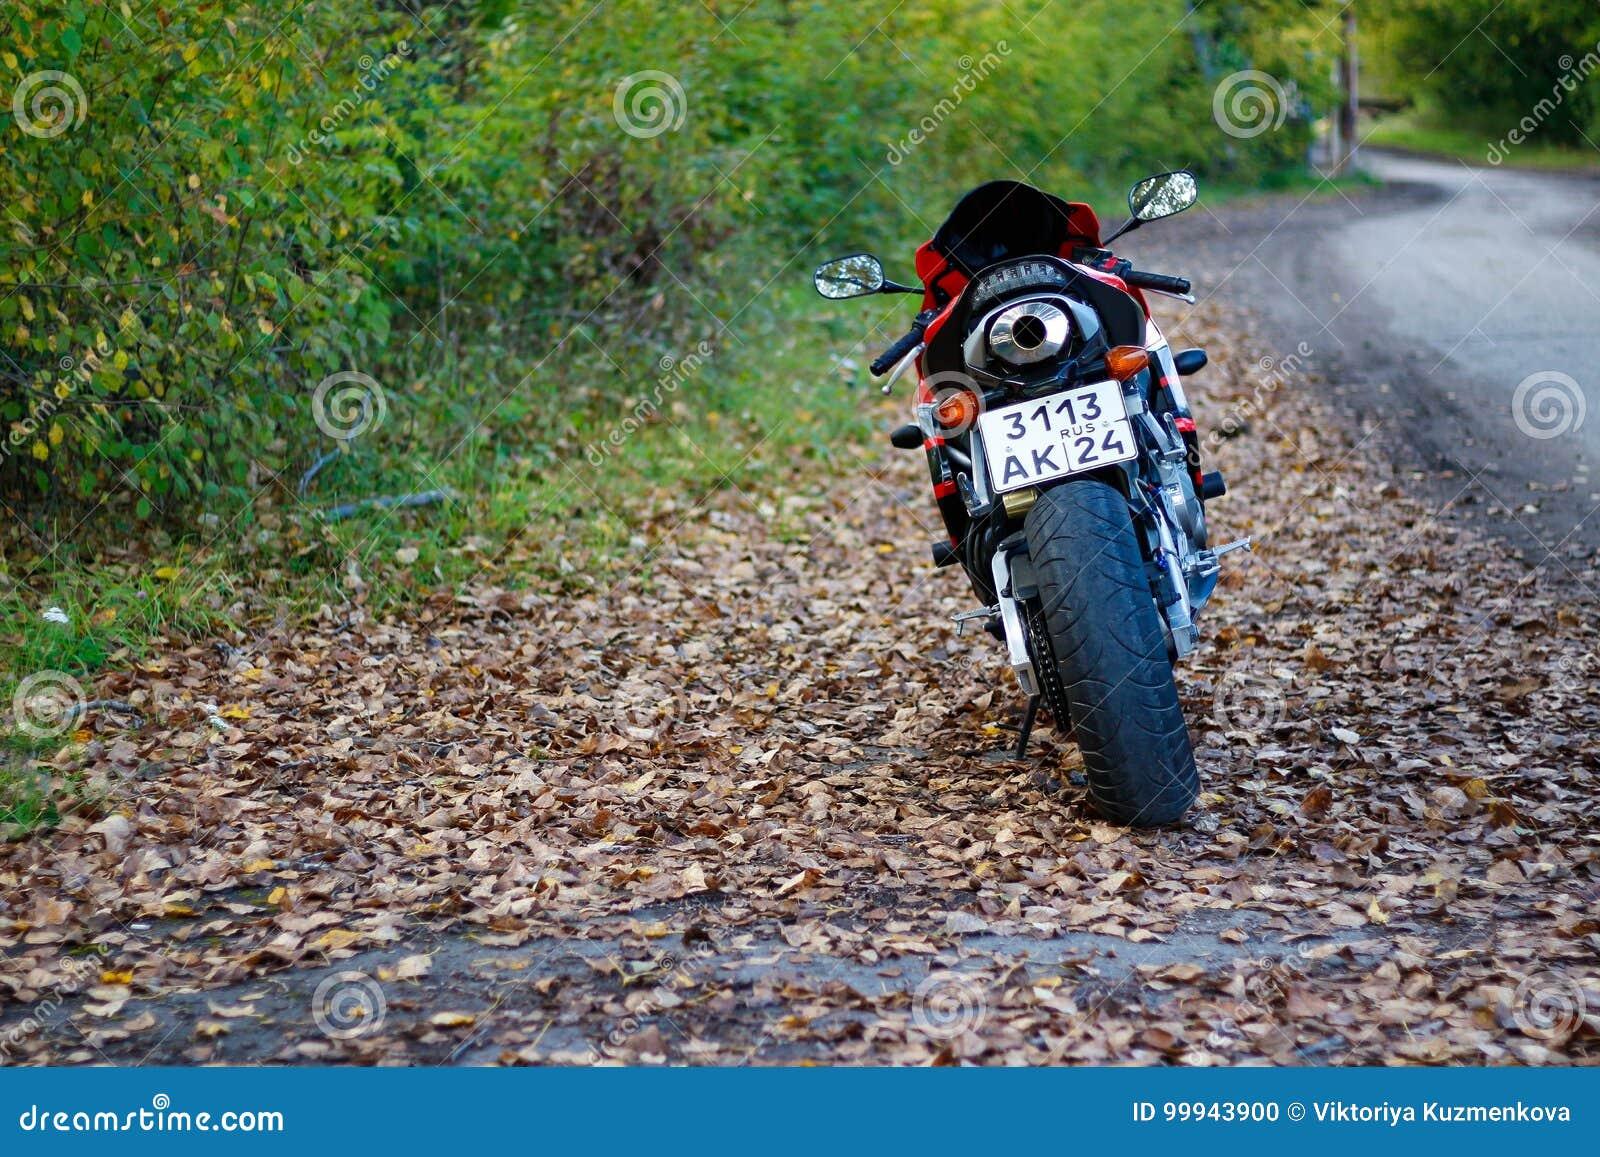 KRASNOYARSK, RUSSIA - SEPTEMBER 1, 2017: Red and black sportbike Honda CBR 600 RR 2005 PC37. Autumn yellow leaves